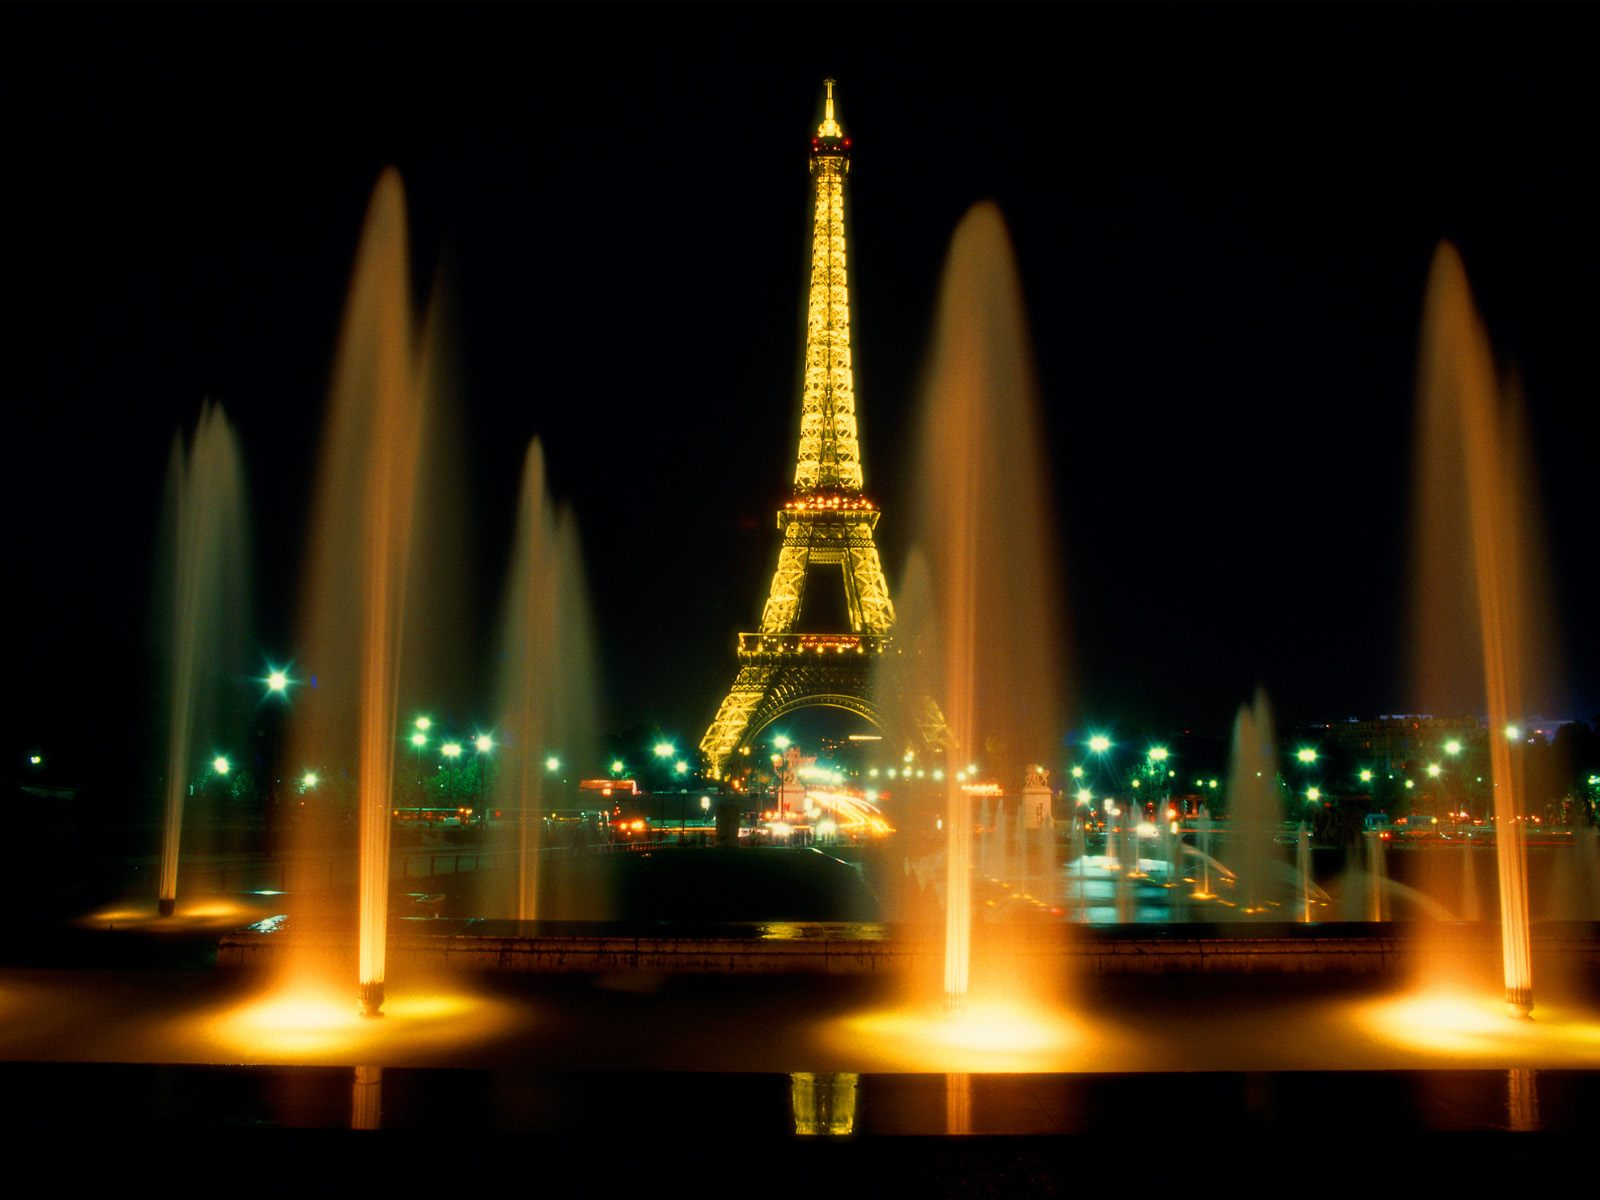 023 - Paris - France - Eiffel - Tower